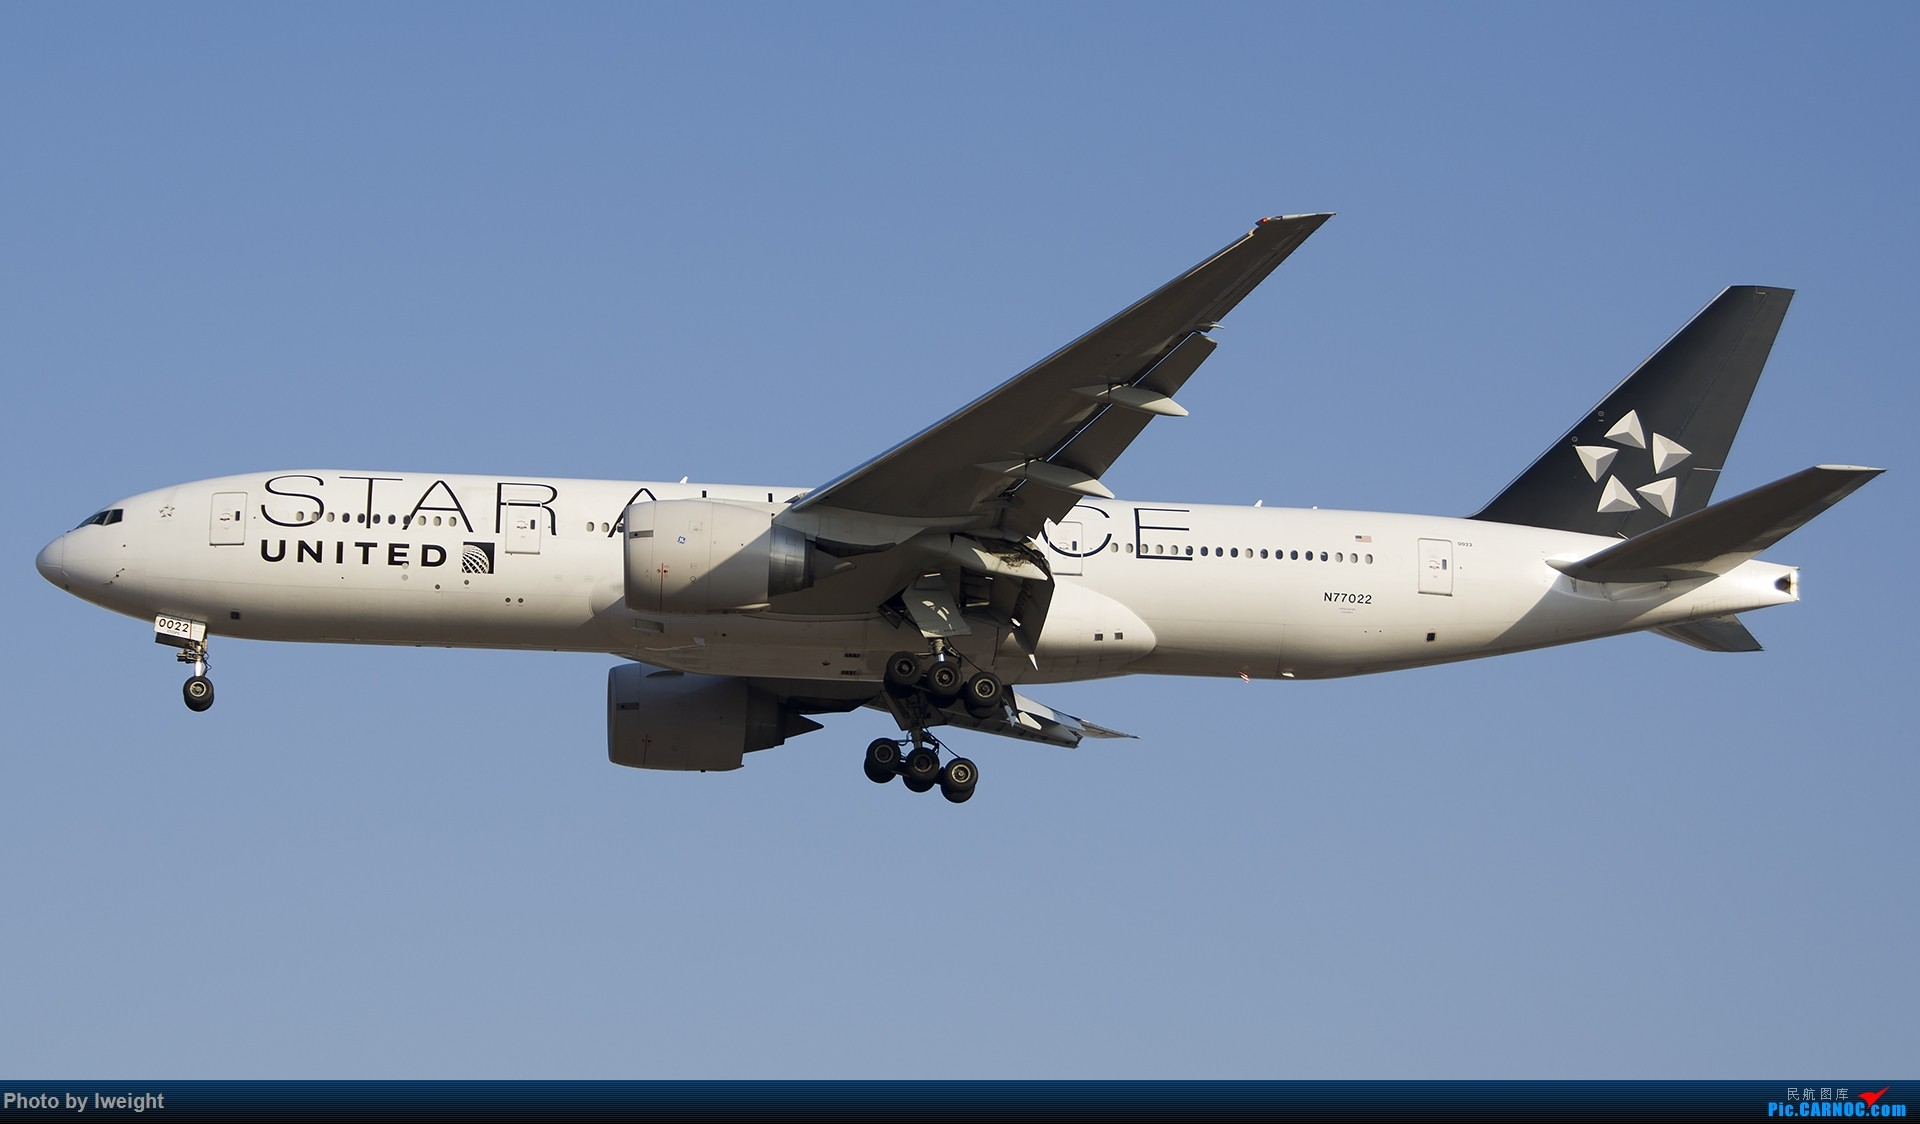 Re:[原创]庆祝升级777,发上今天在首都机场拍的所有飞机【2014-12-14】 BOEING 777-200ER N77022 中国北京首都国际机场